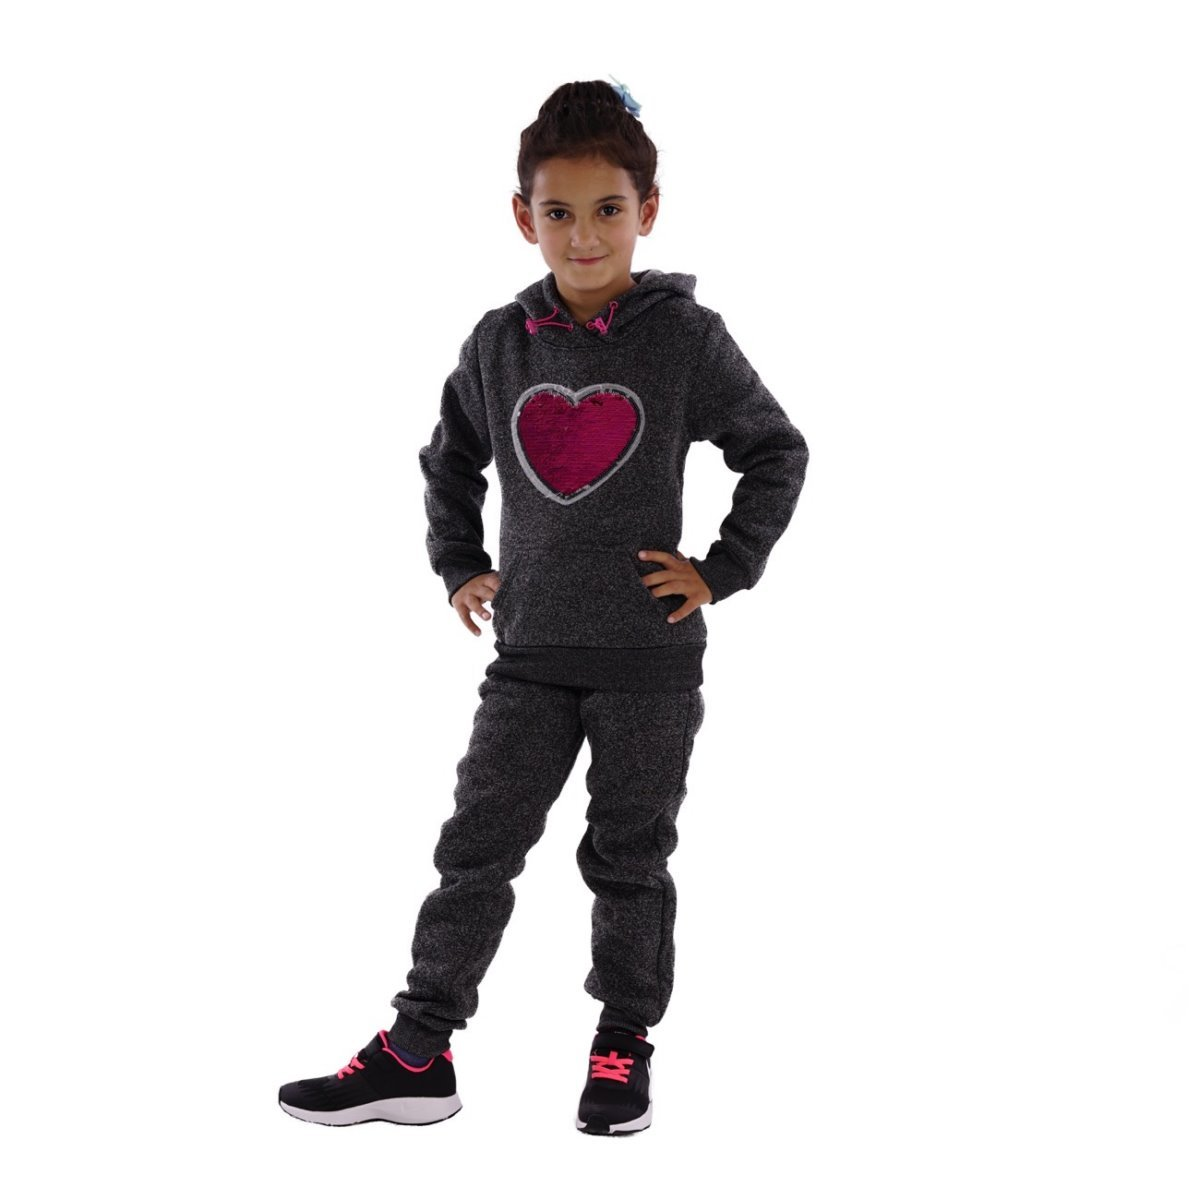 Fashion4Young Kinder Jogginganzug Freizeitanzug Herz Heart Sweater Joggpants f M/ädchen